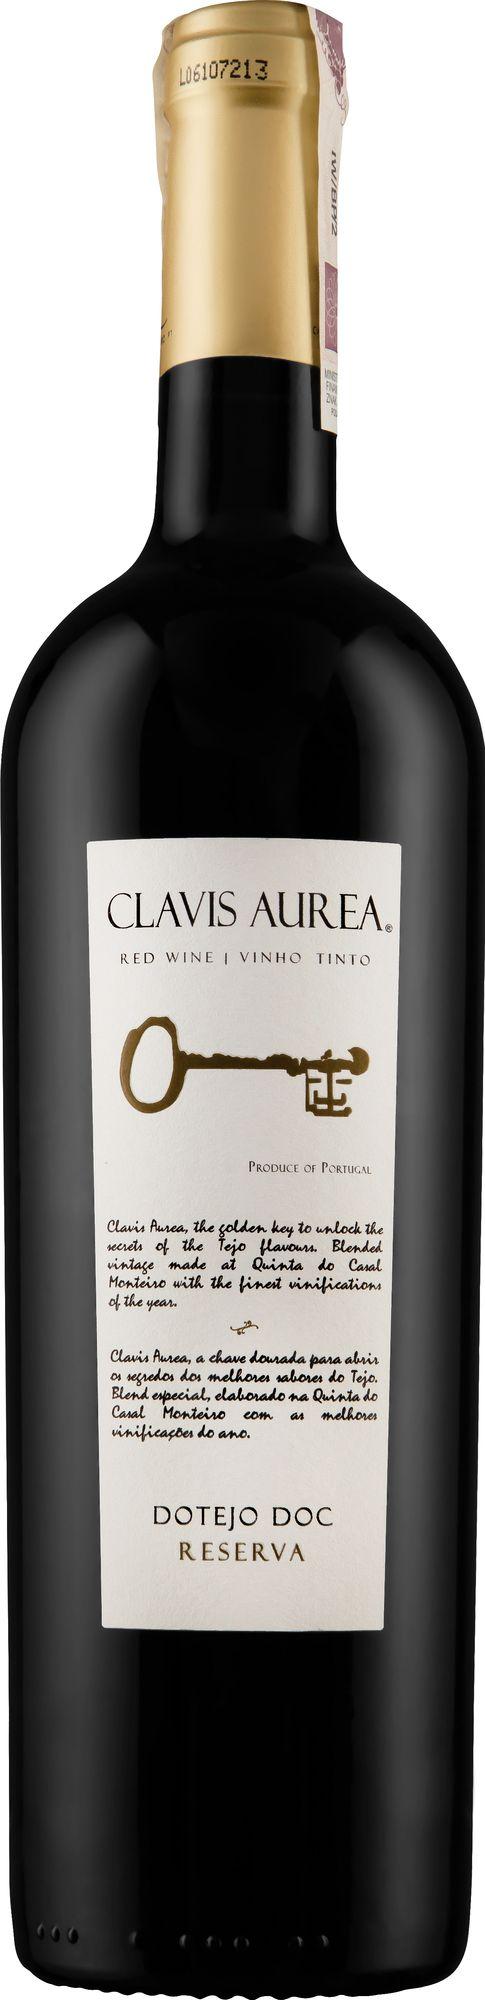 Wino Casal Monteiro Clavis Aurea Do Tejo DOCG